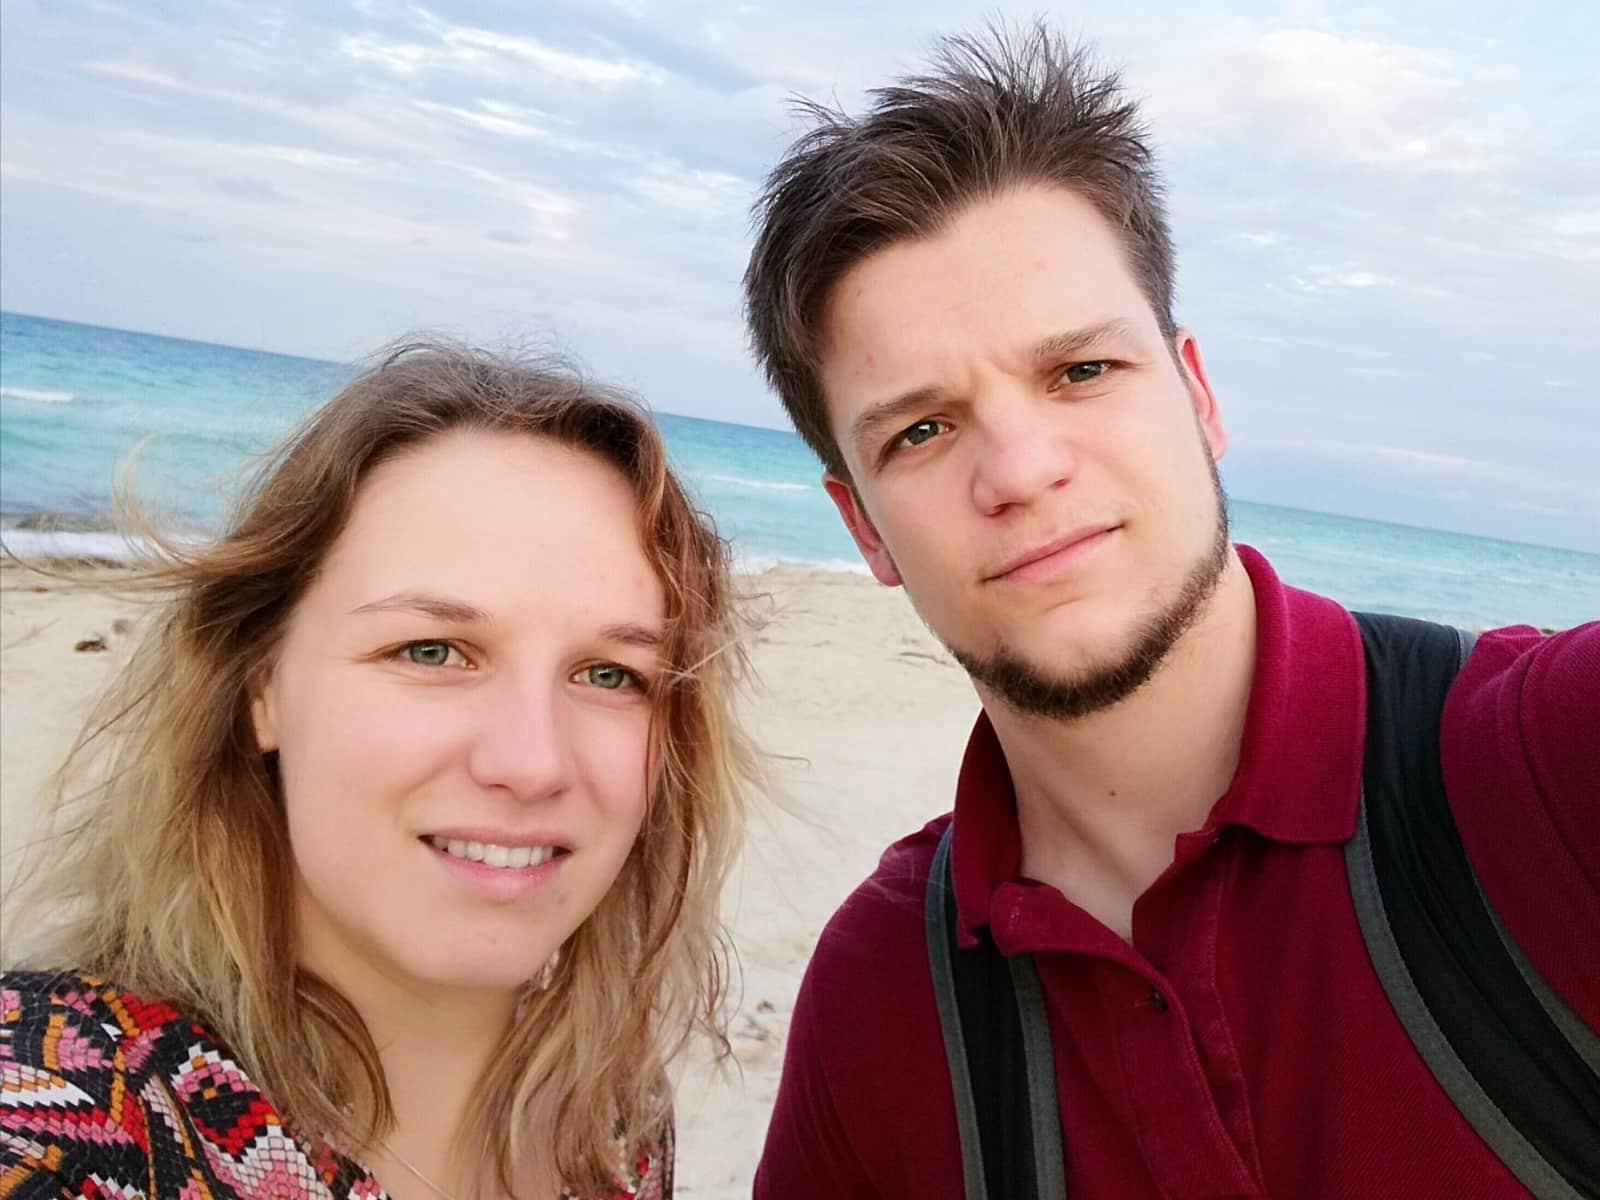 Maud & Emmanuel from Namur, Belgium